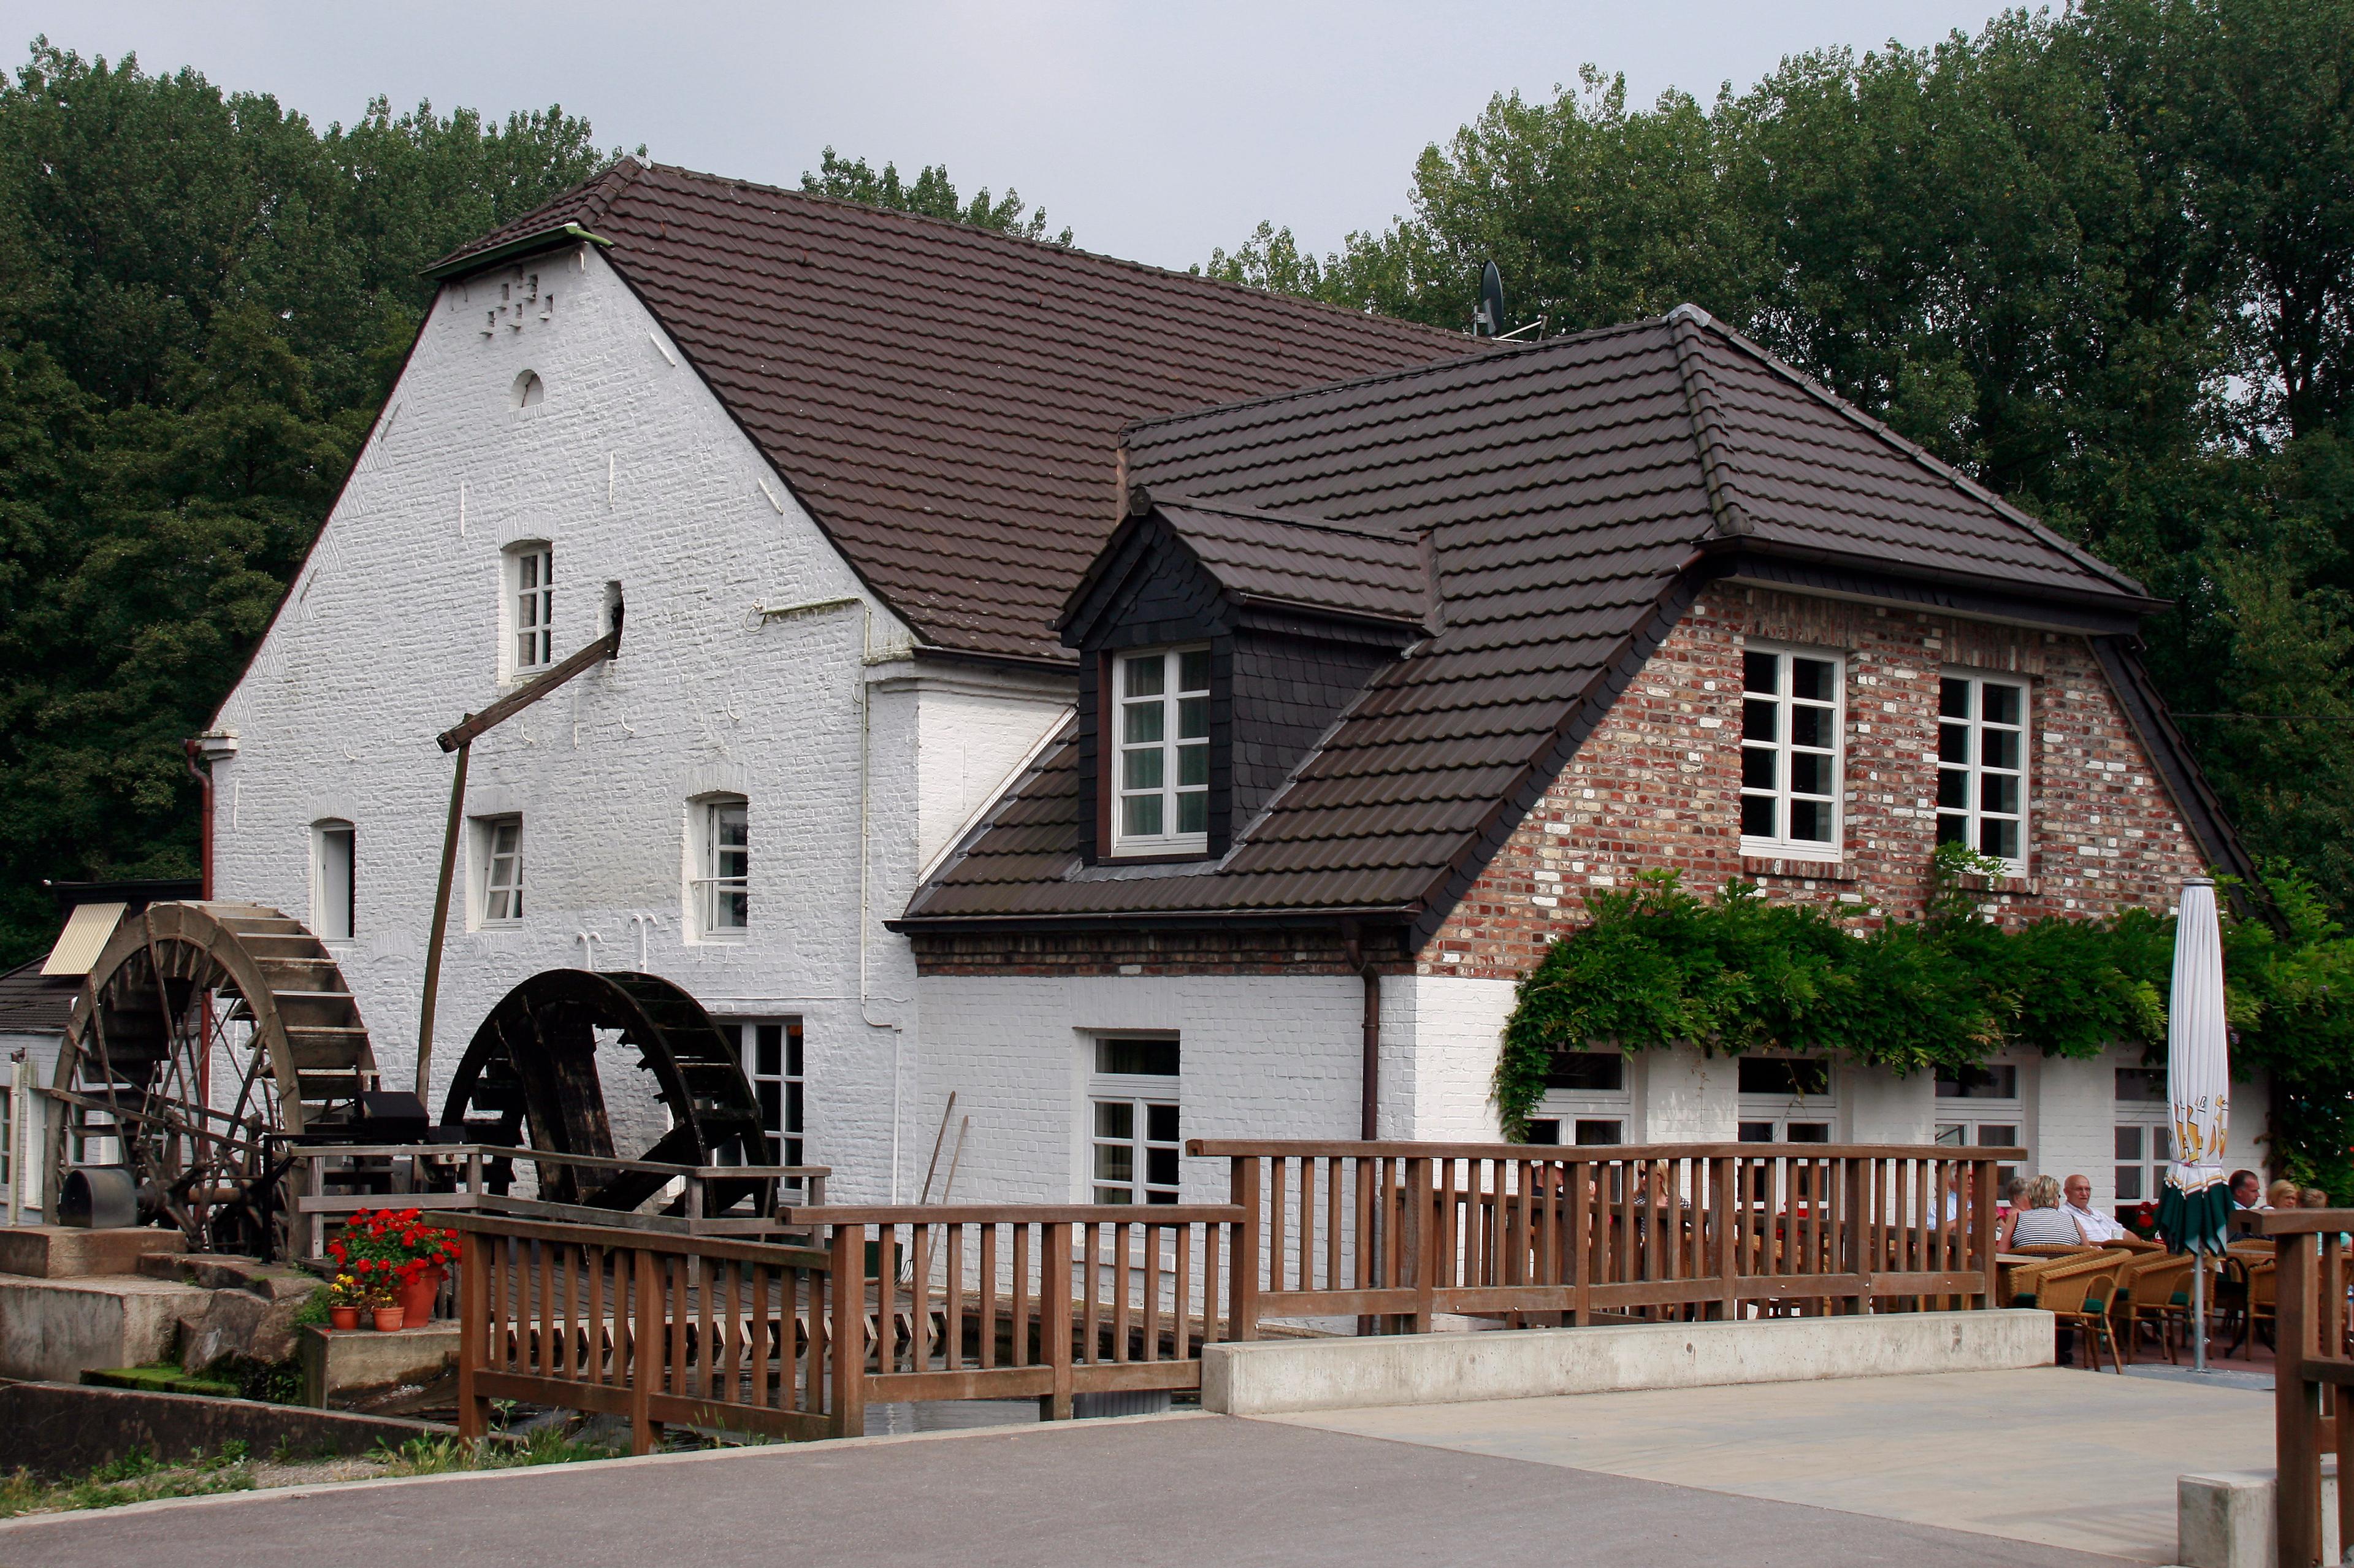 Heynckes Bauernhof